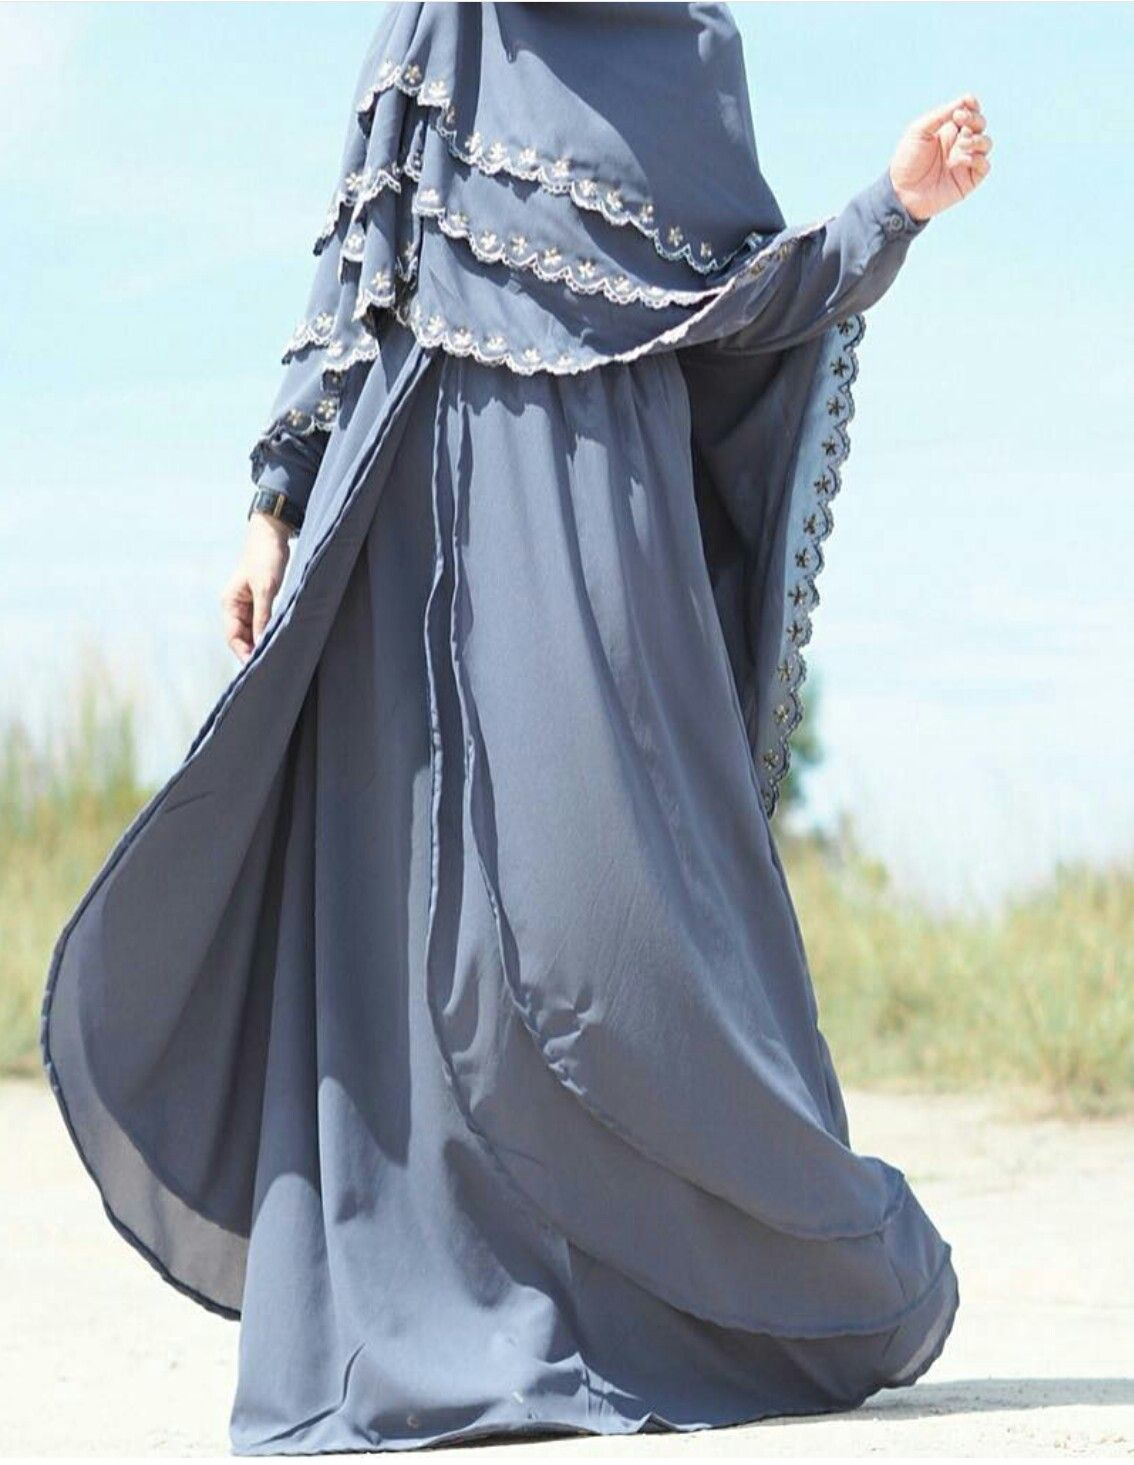 Pin by ayse mahir on hijab pinterest niqab modest fashion and